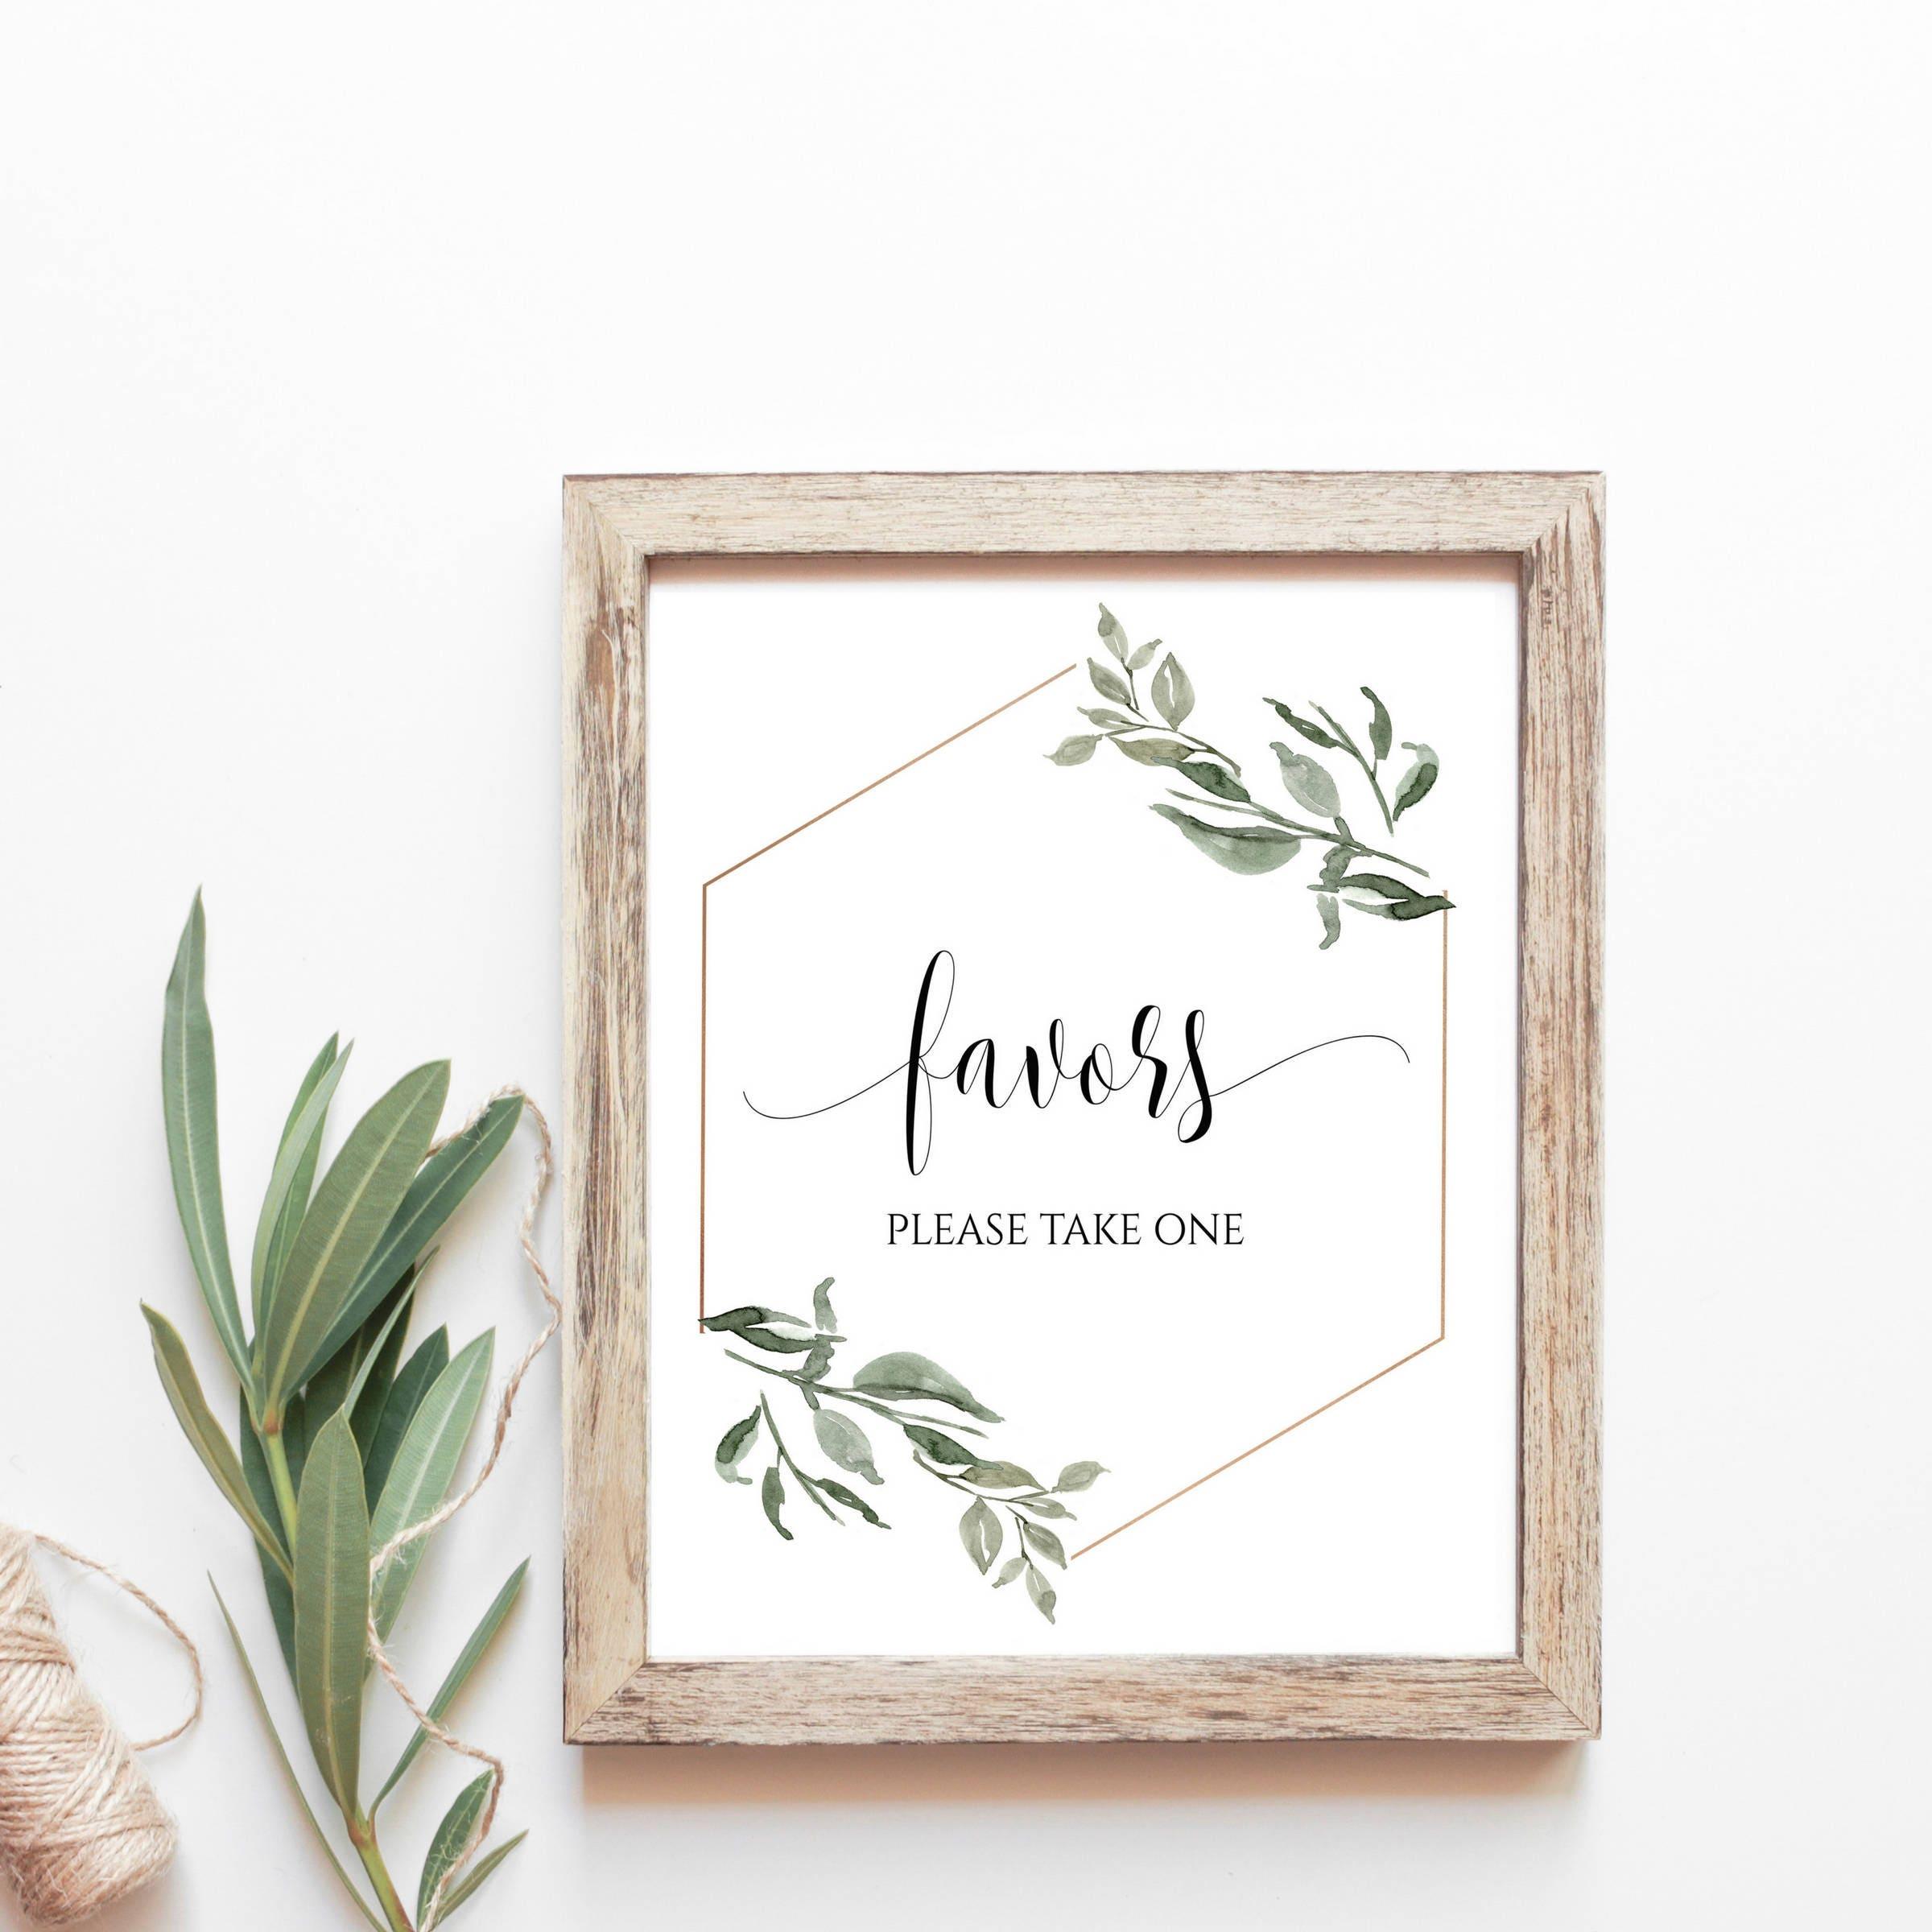 Favors Sign Download Favors Sign For Wedding Favors Sign